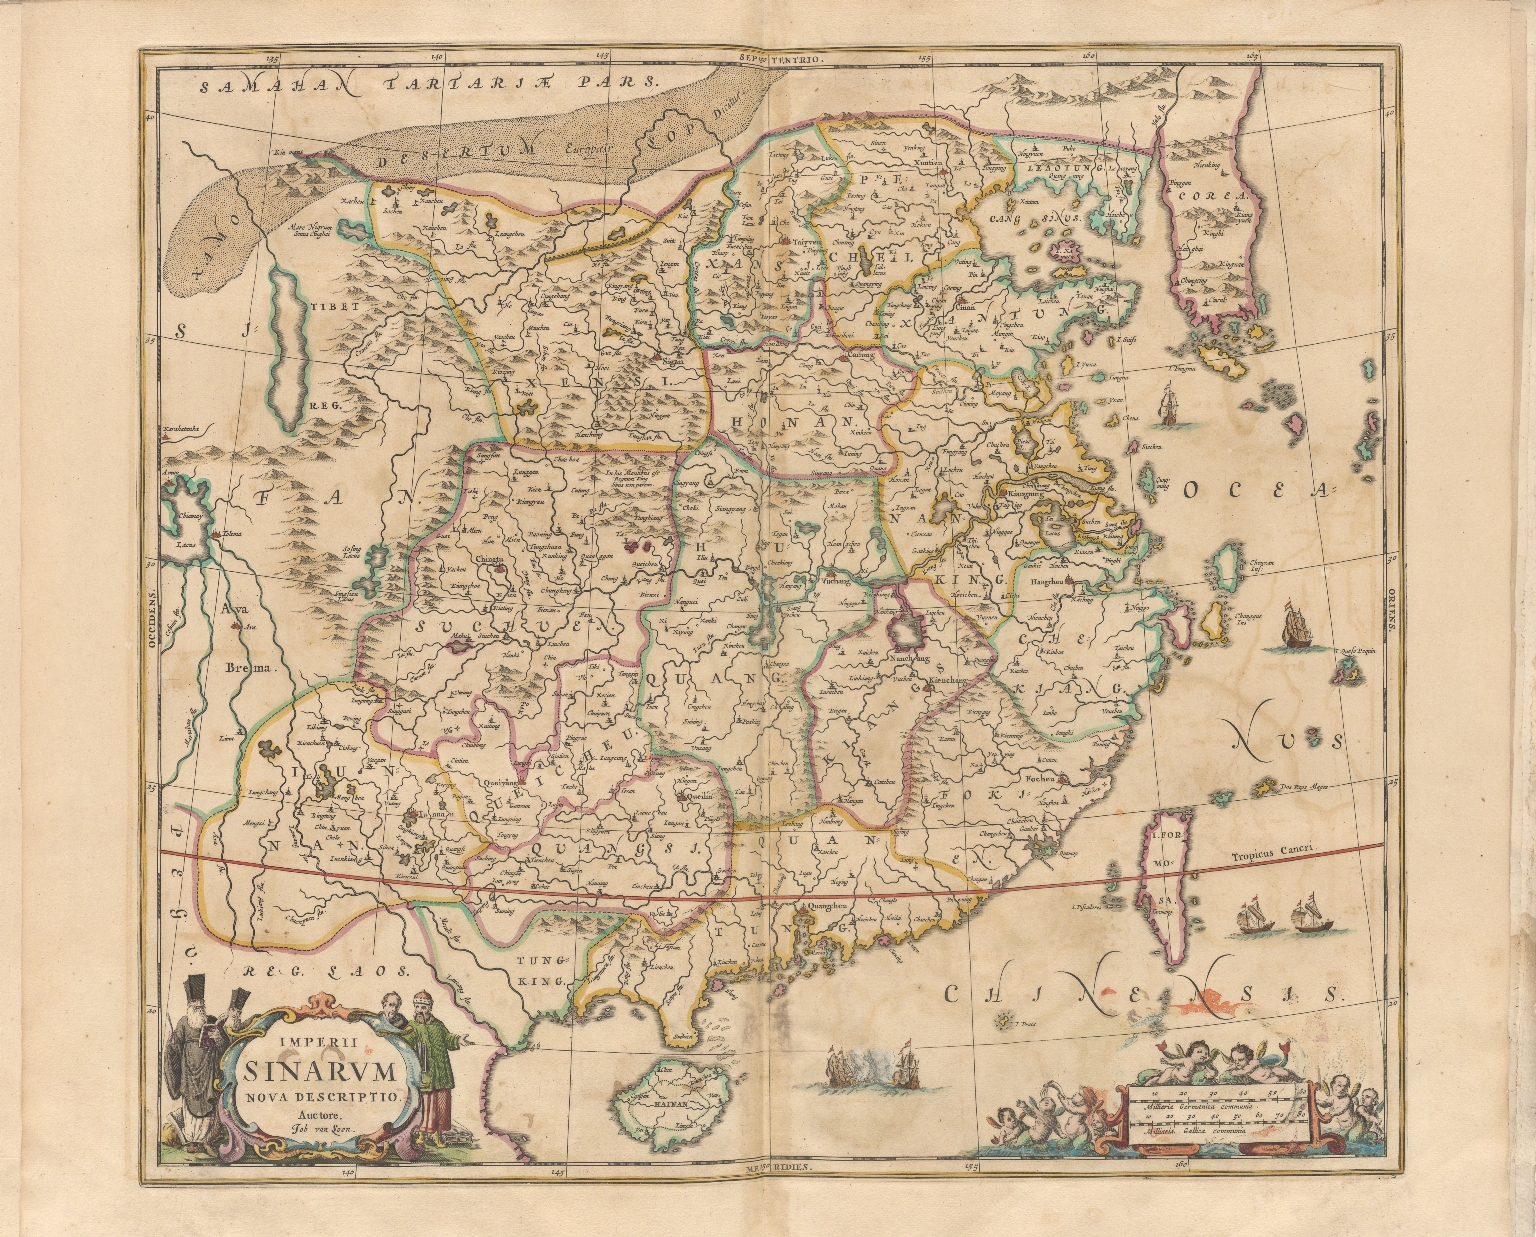 Imperii Sinarum nova descriptio